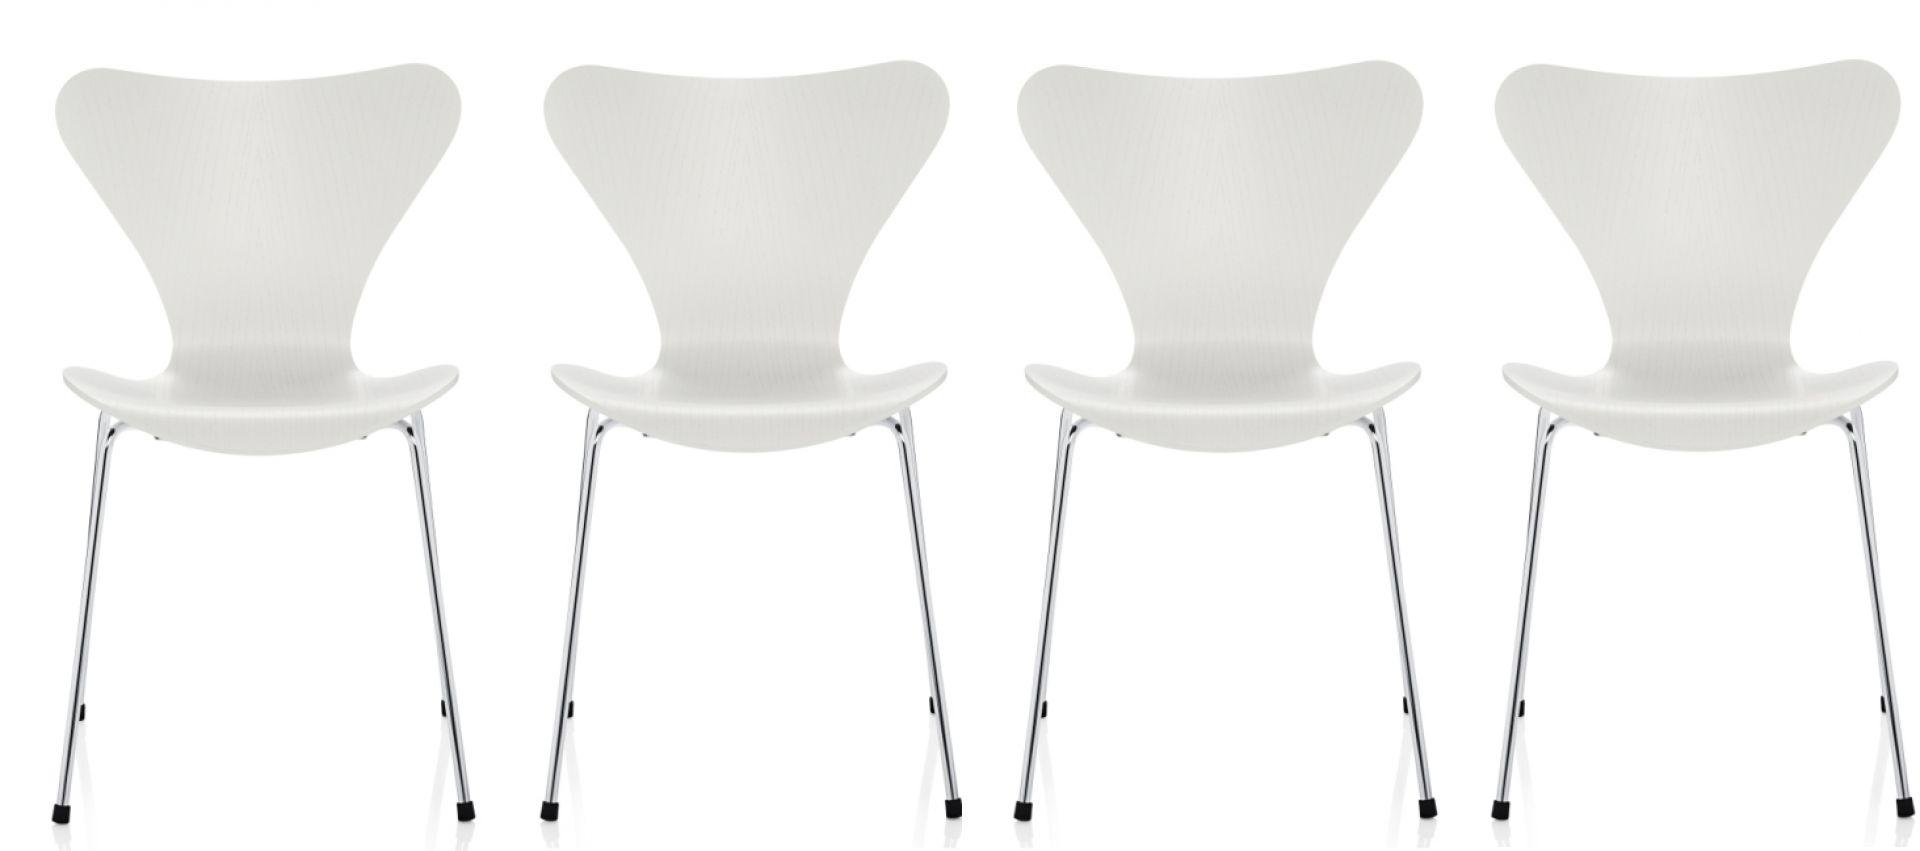 Siebener / Serie Stuhl 3107 Esche 4-er Set Fritz Hansen